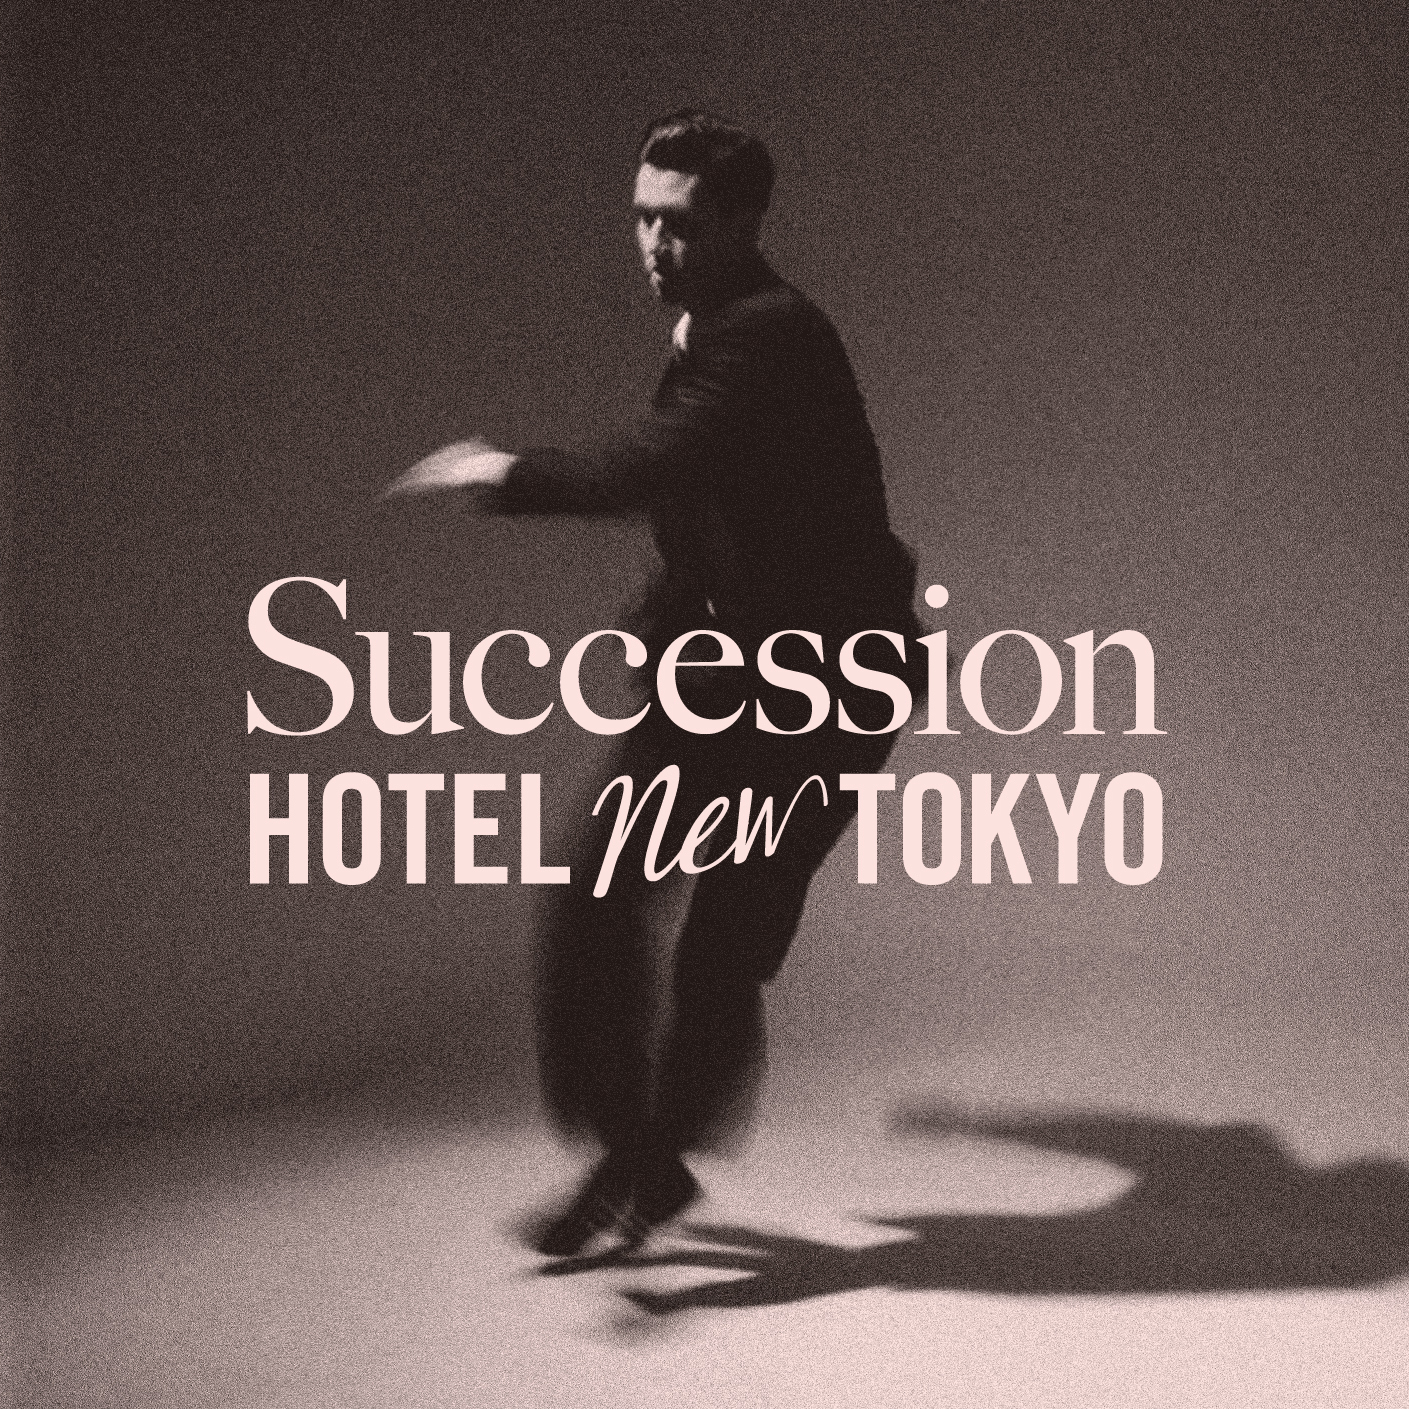 http://rose-records.jp/files/SUCCESSION.jpg